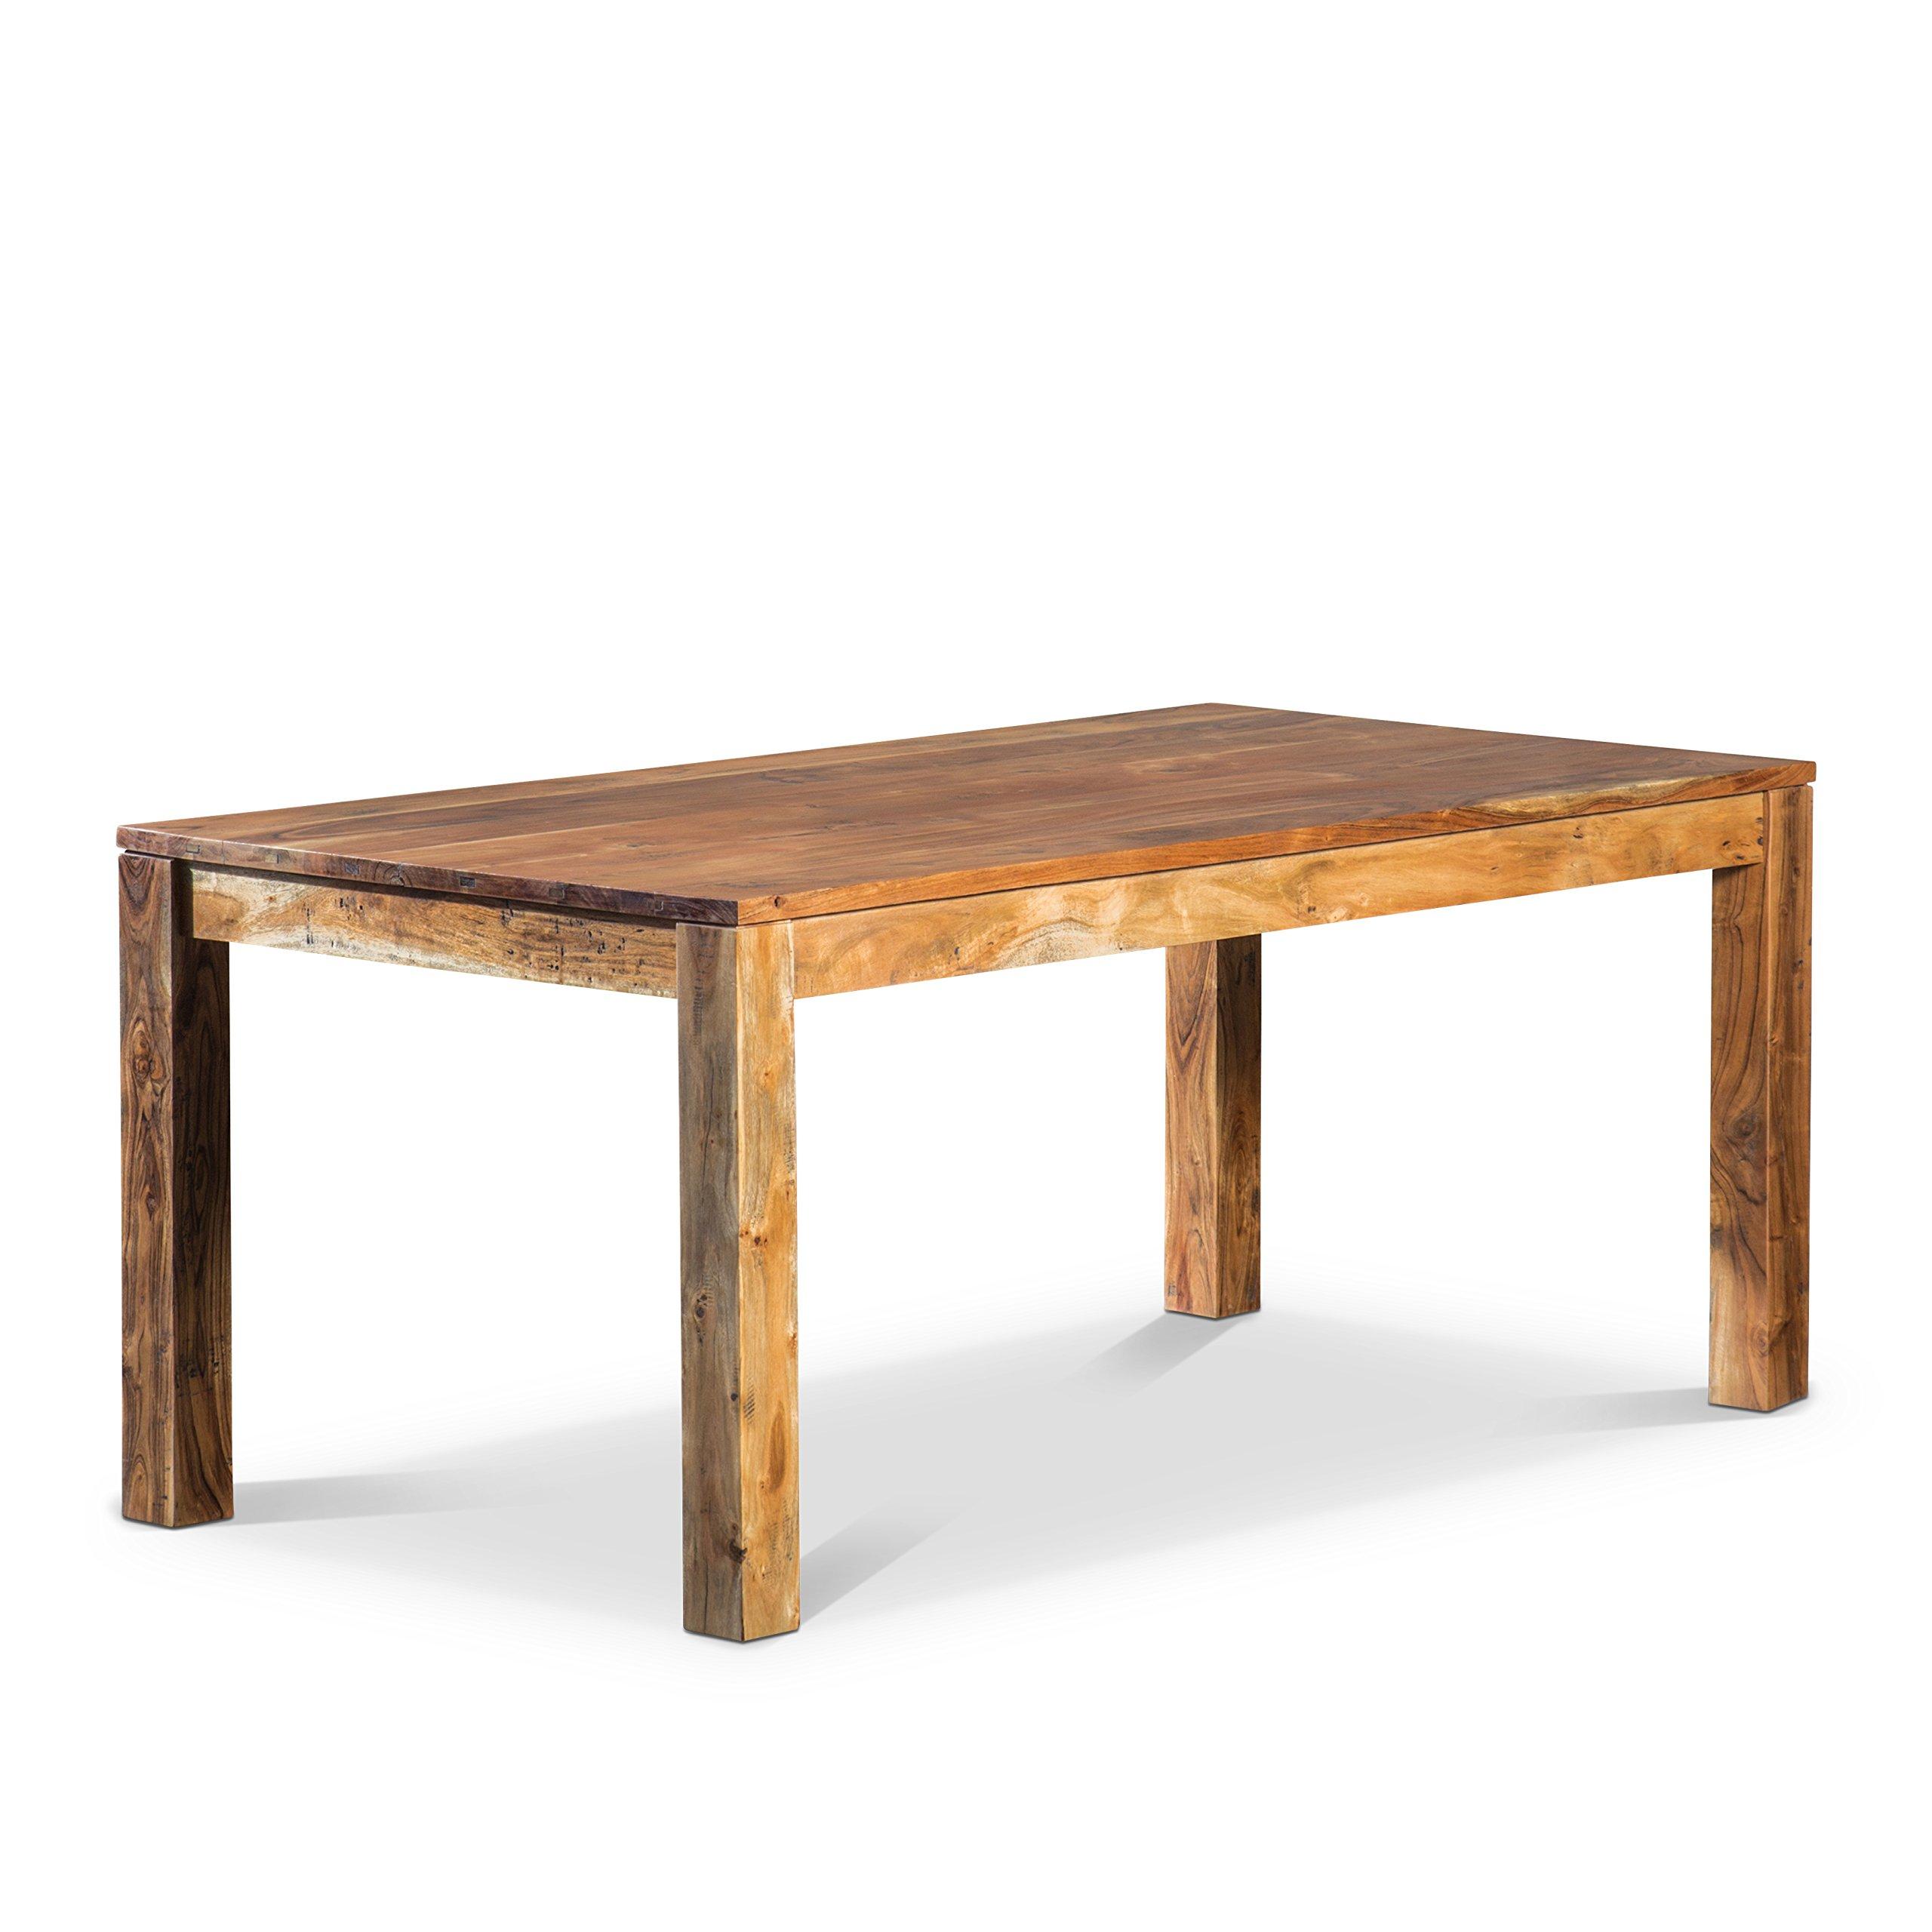 Artemano Romy Table Made of Acacia Wood, 58''x40''x30''